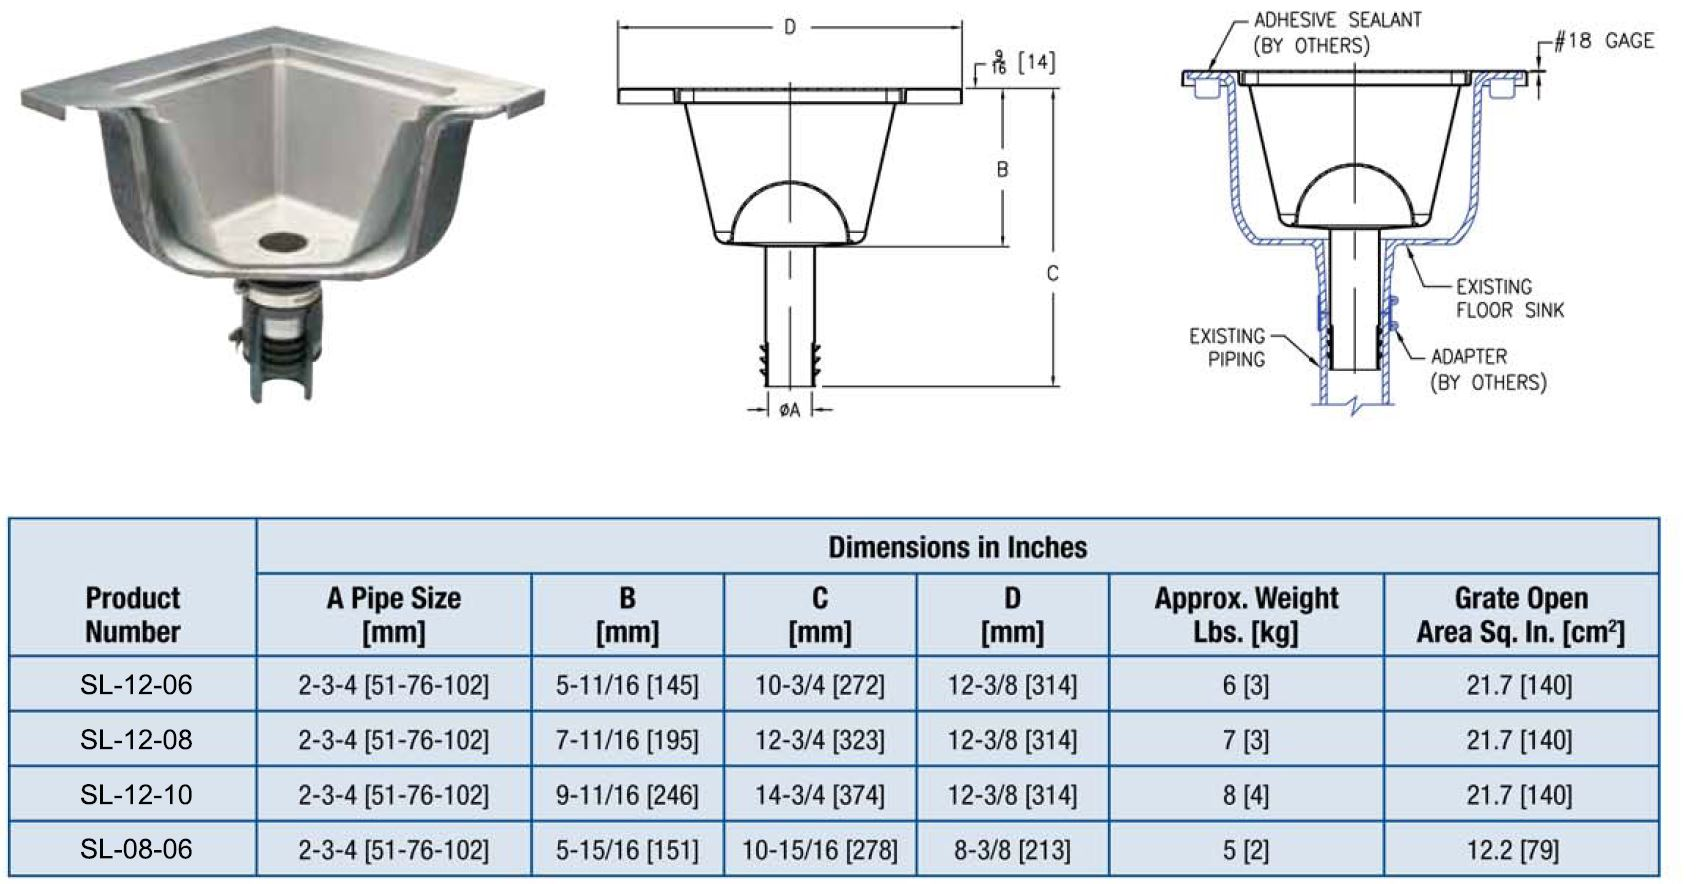 3 drain floor sink 12 x12 restaurant food service sanalofisonline commercial kitchen equipment